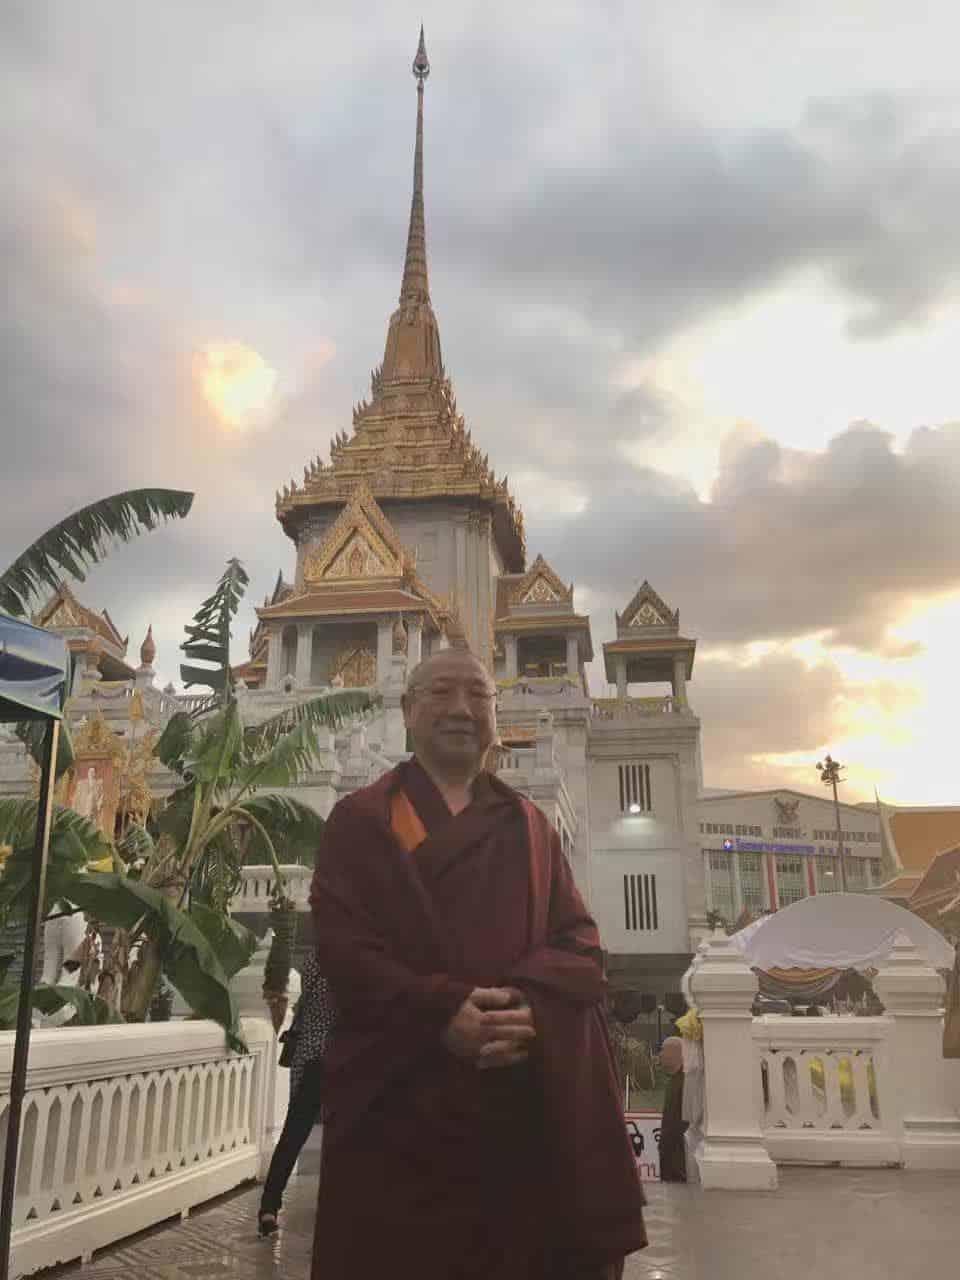 Gosok Rinpoche Thailand 2017 T011 89c534bde5df03cccfd2d388736bebb